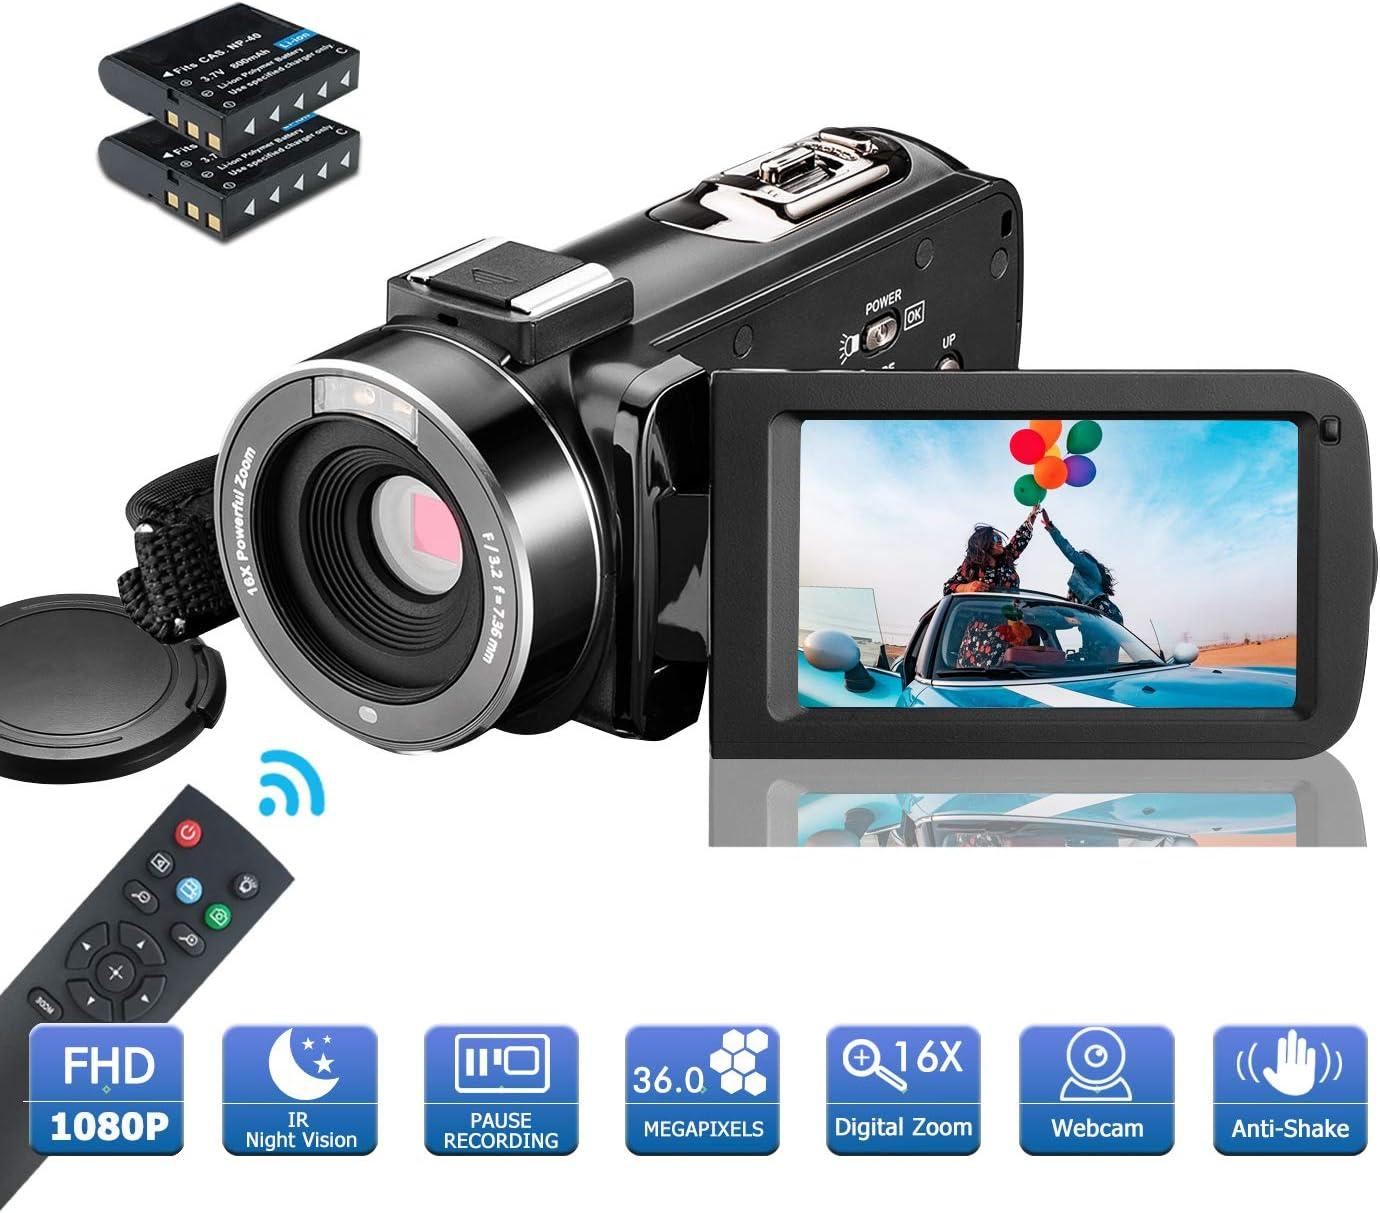 MELCAM Videocámara 1080P 36MP Camcorder IR Visión Nocturna Youtube Vlog Cámara Web 3.0